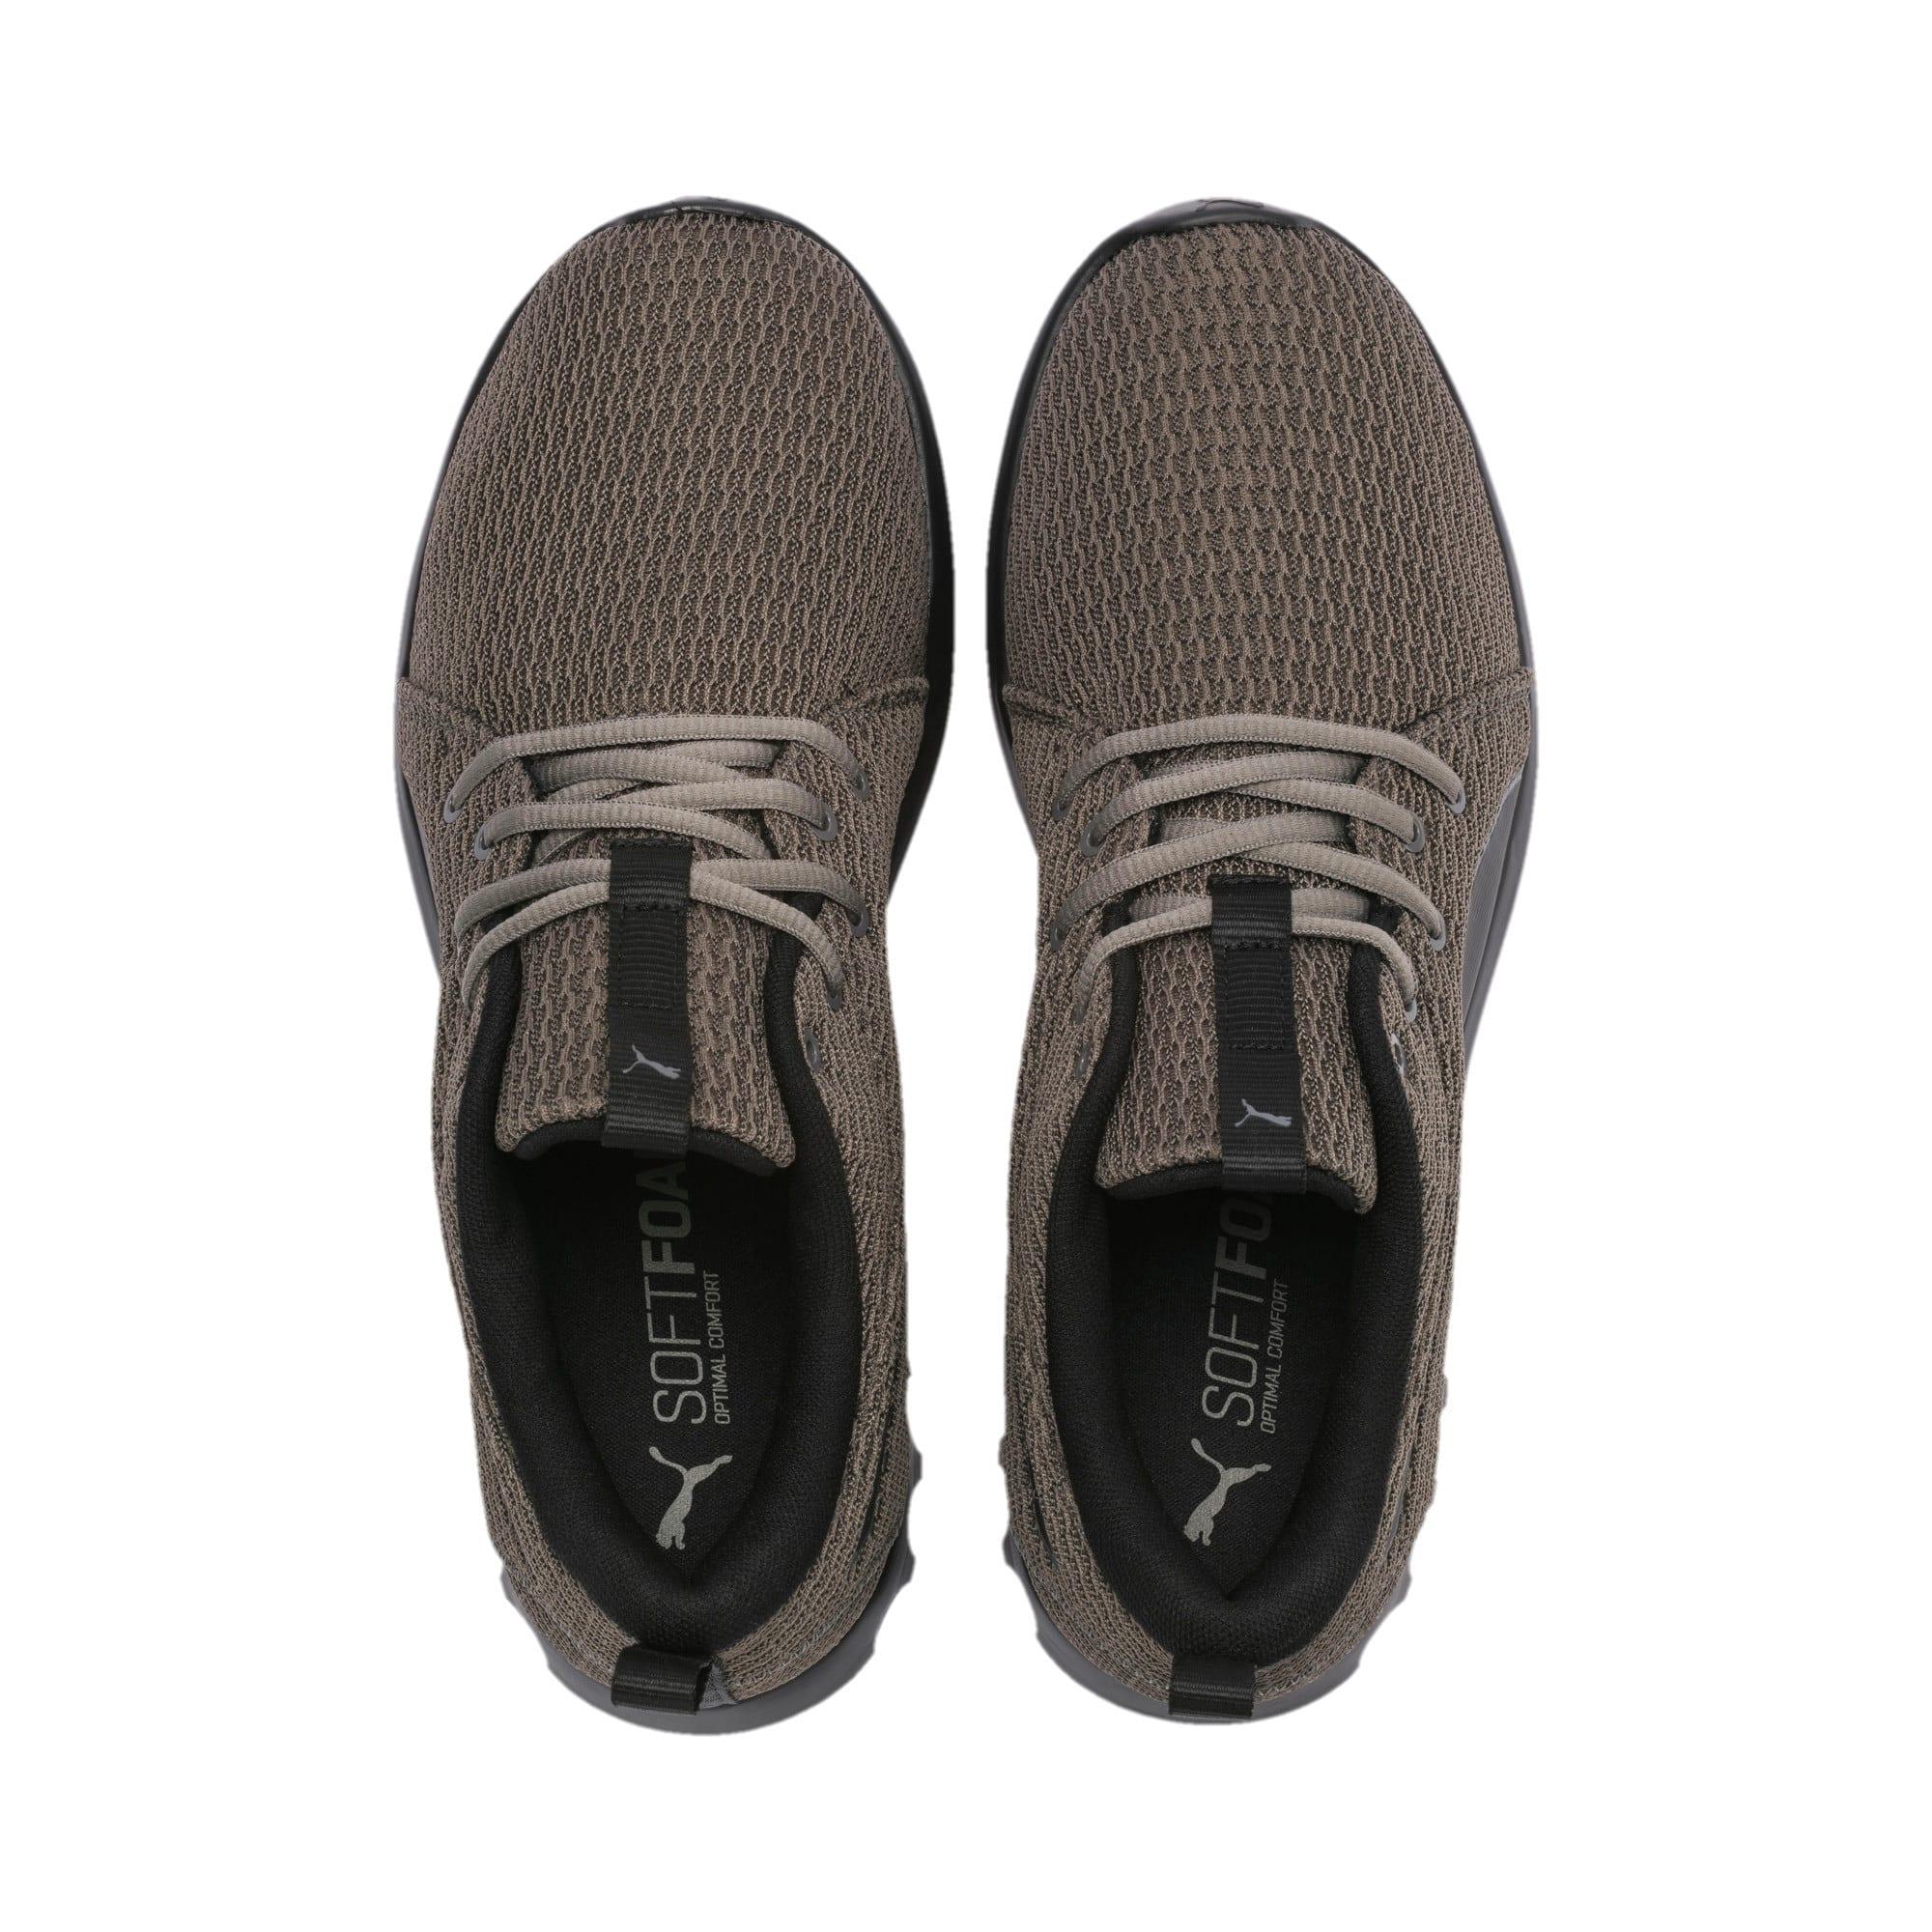 Thumbnail 6 of Carson 2 New Core Men's Running Shoes, Charcoal Gray-Puma Black, medium